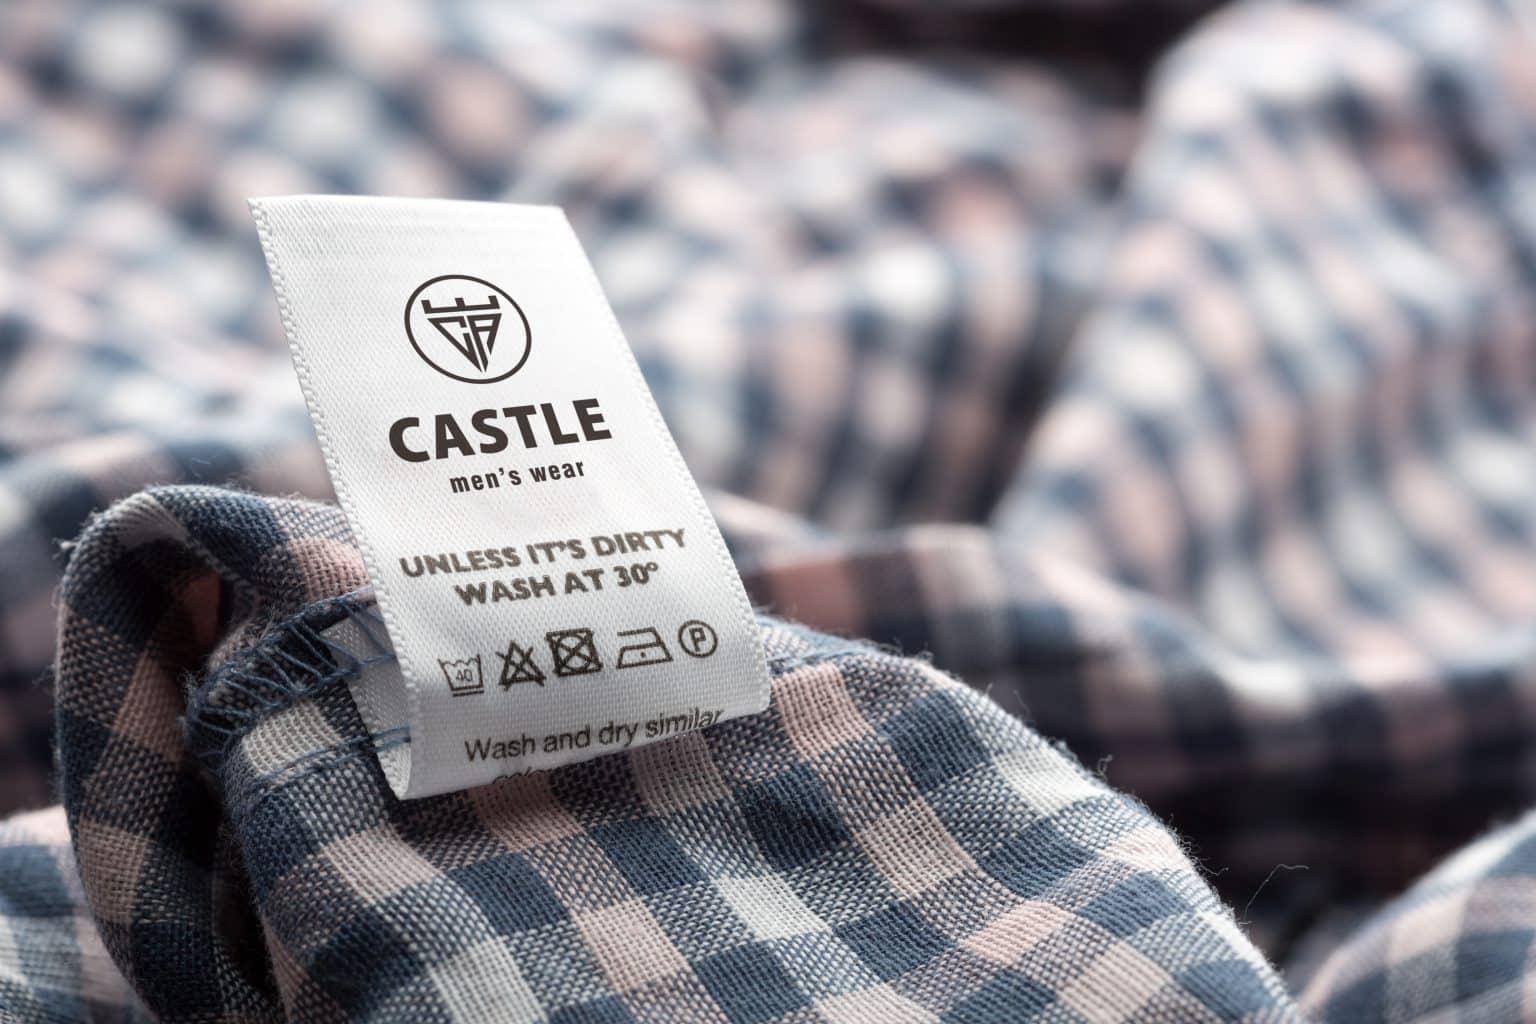 Castle日韓潮流男裝LOGO設計 形象設計 品牌設計 商標設計